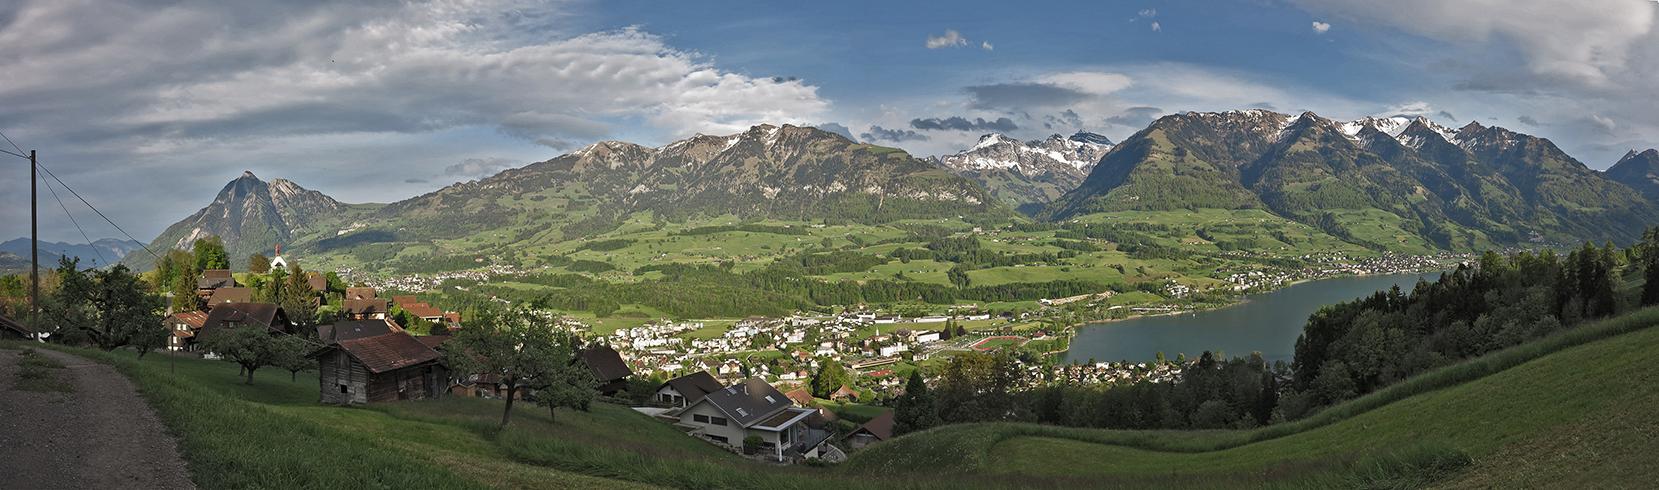 Oberhalb Ramersberg die Aussicht geniessen (1)